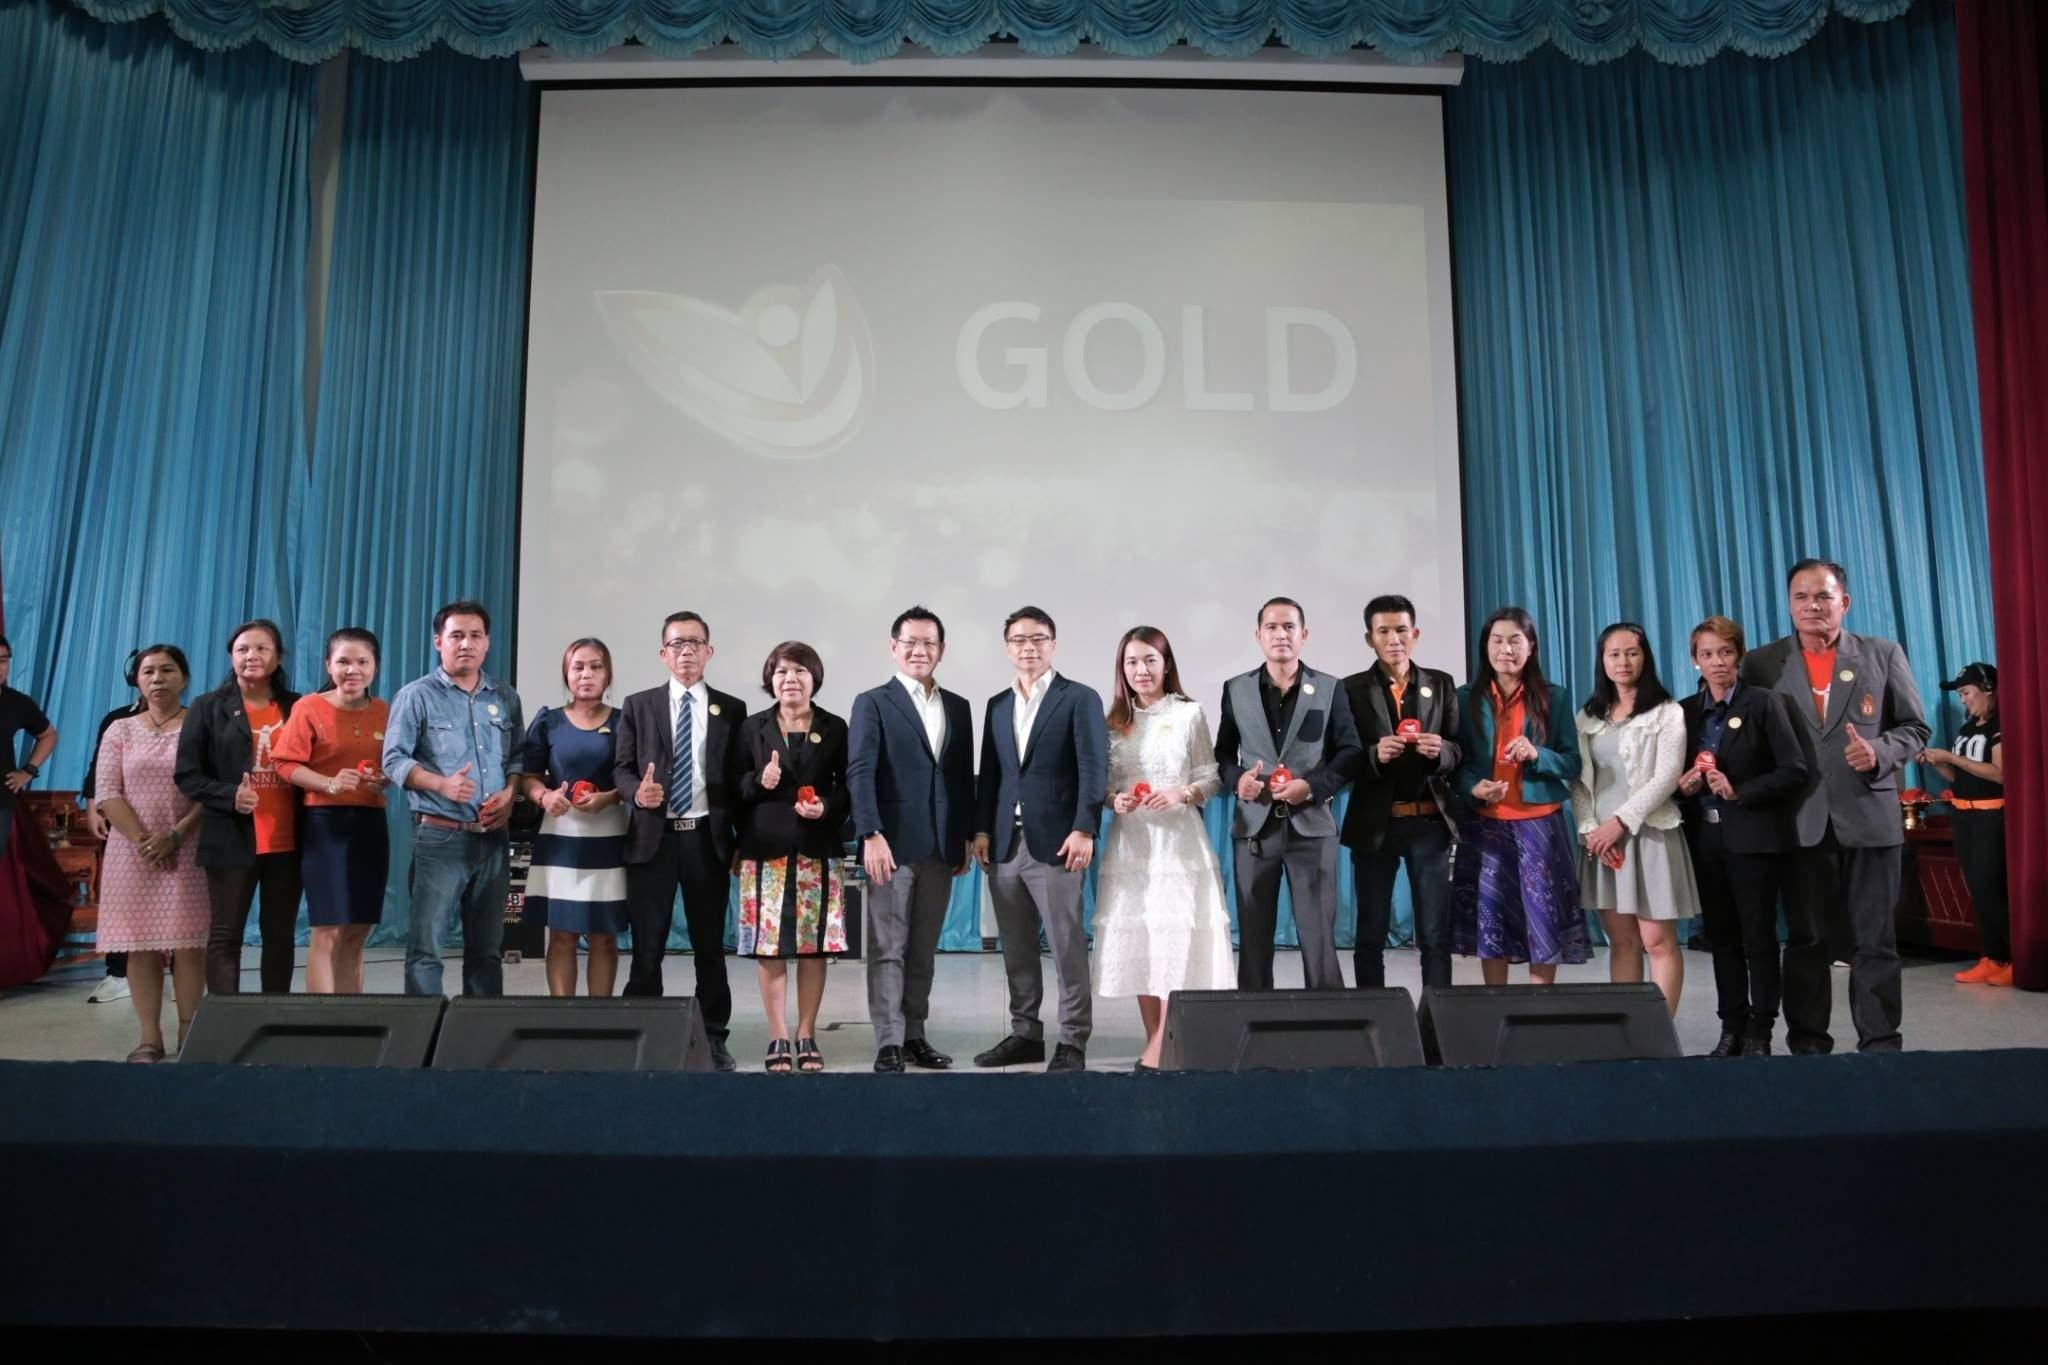 SUCCESSMORE INSPIRATION ครั้งที่ 6 จ.ขอนแก่น (4)